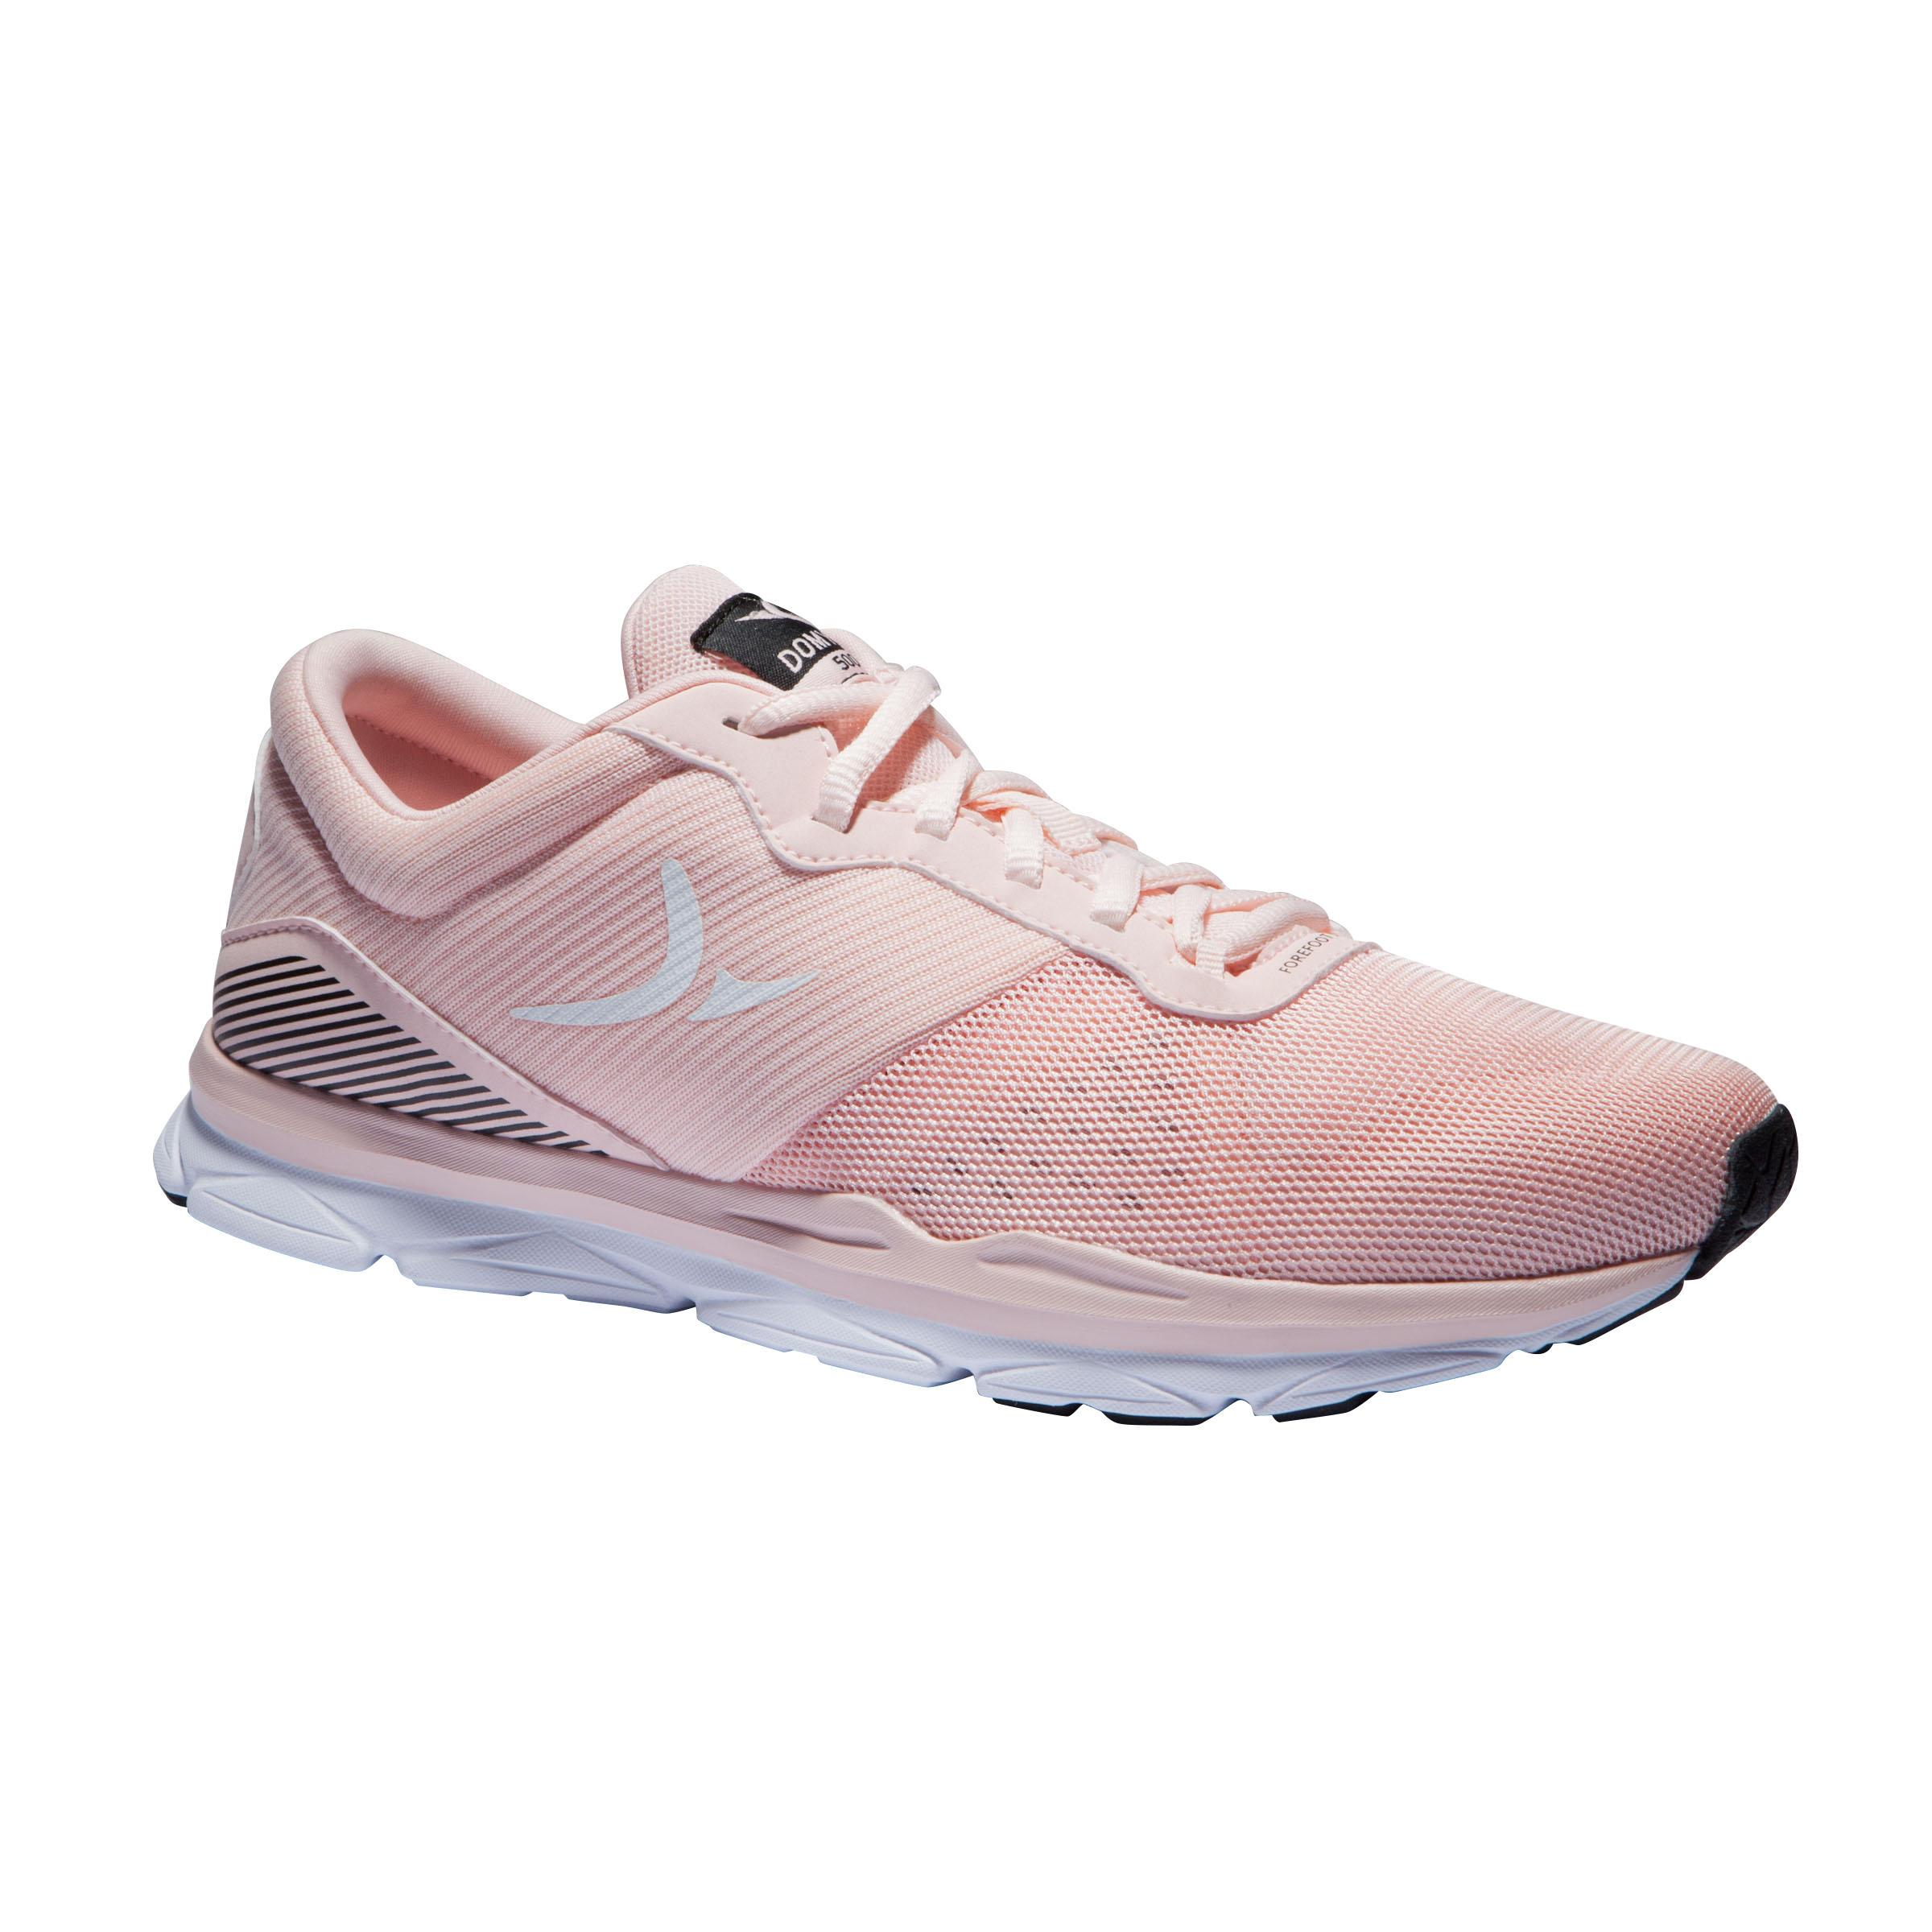 Fitnessschuhe 500 Fitness Cardio Damen rosa | Schuhe > Sportschuhe | Rosa - Weiß | Domyos